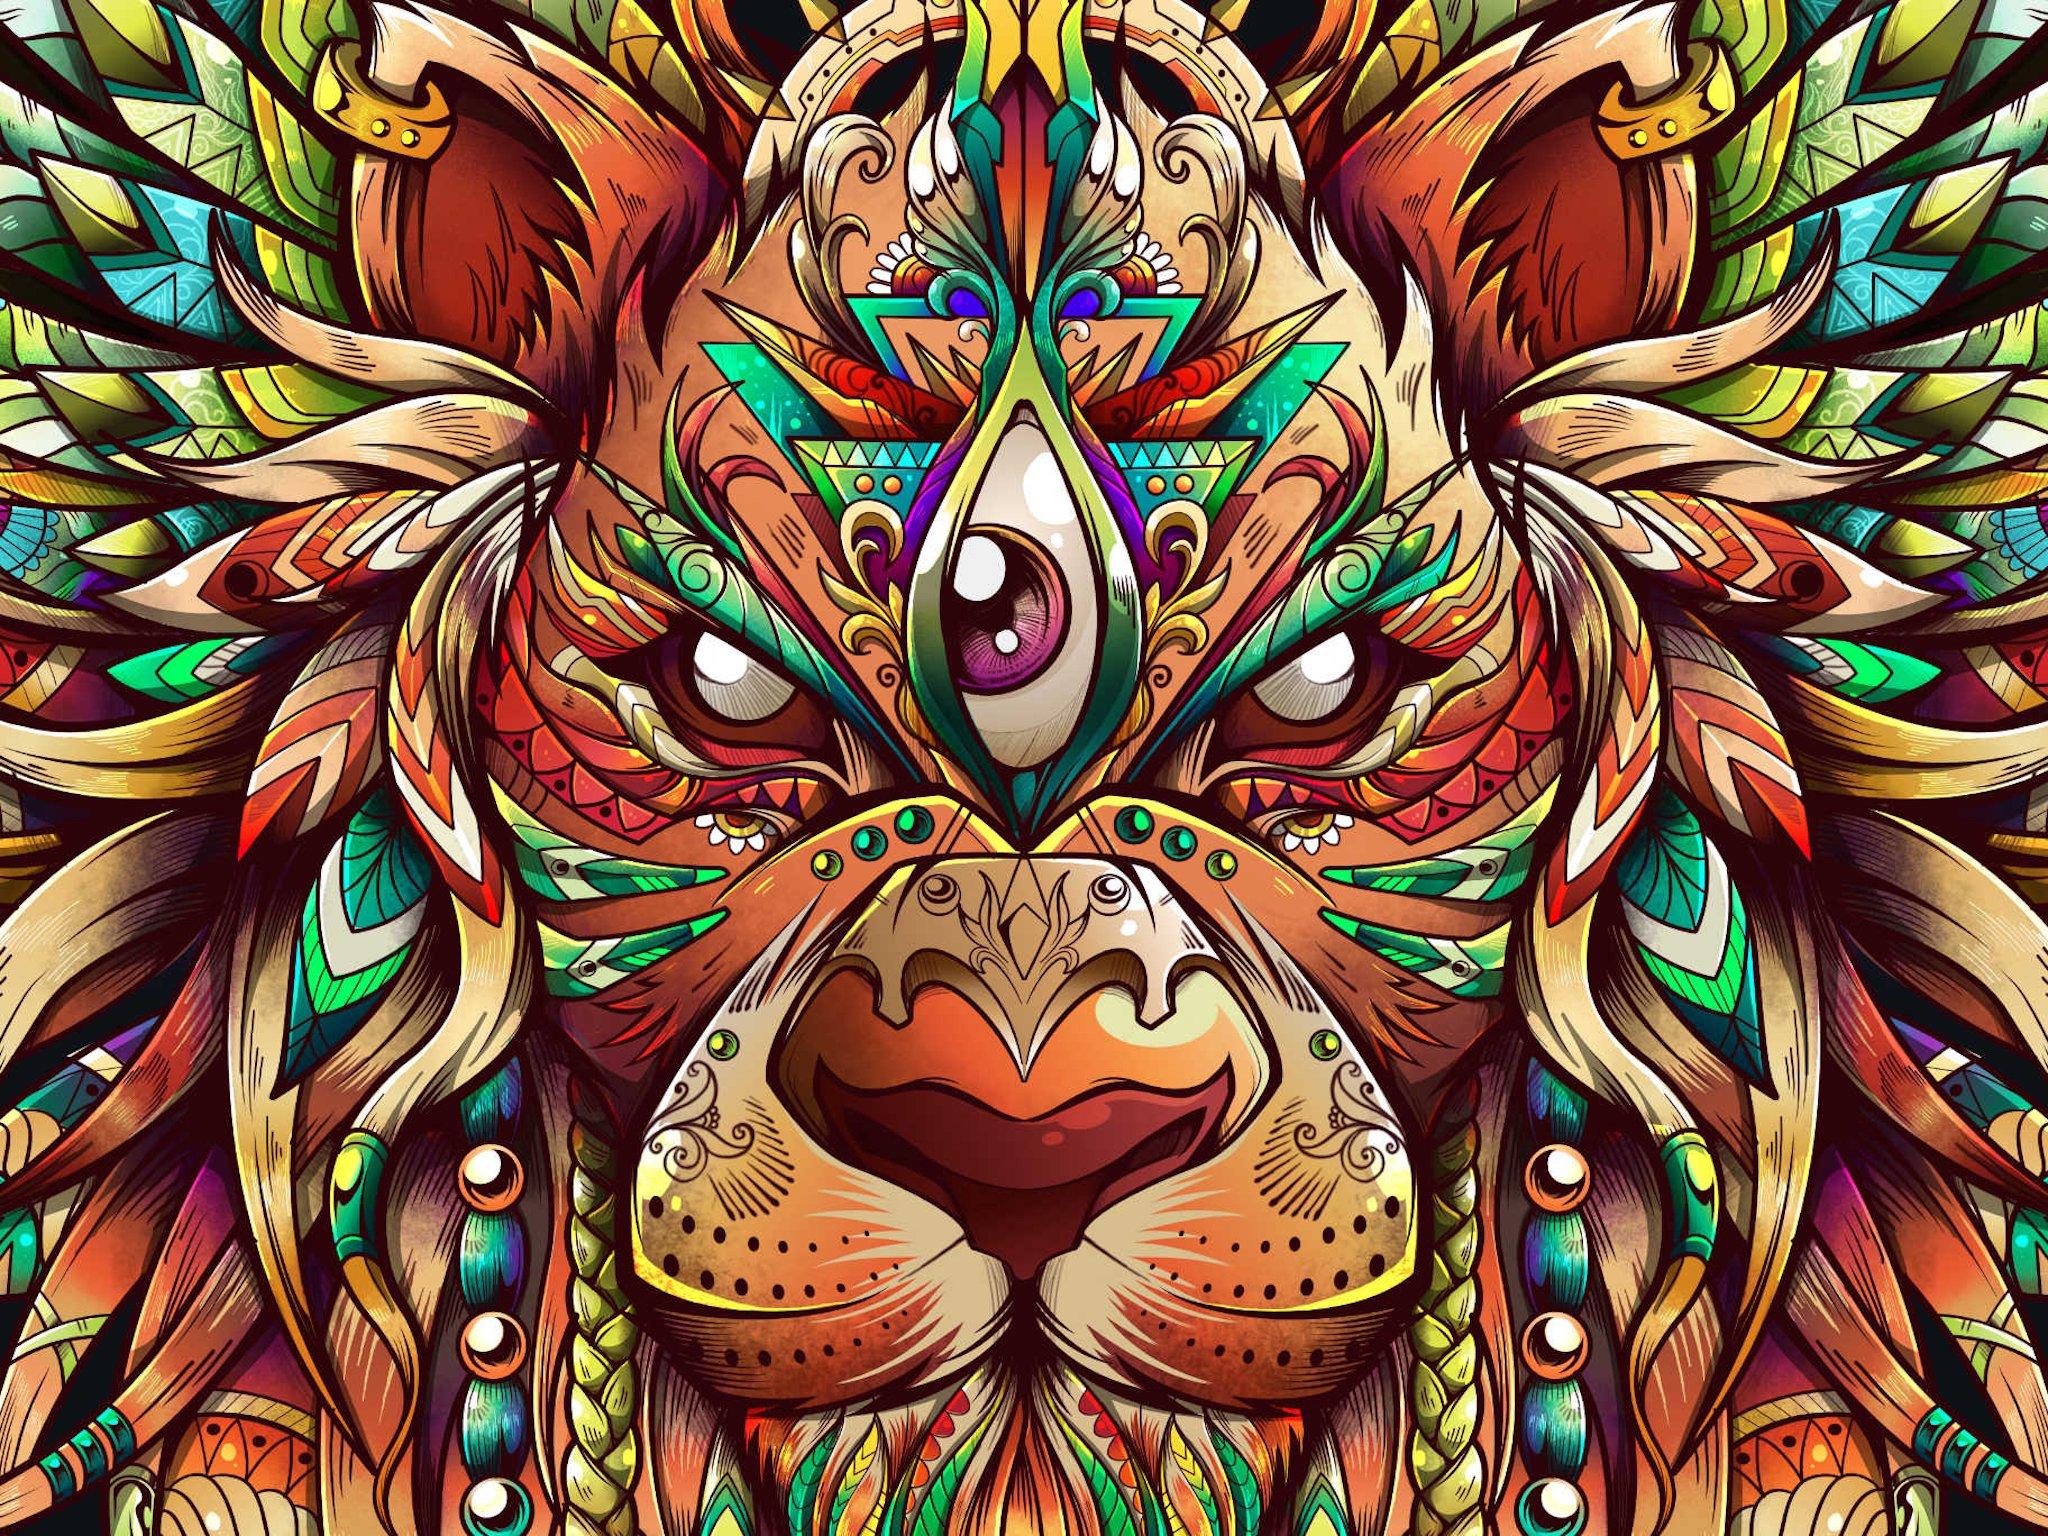 Art Design Styles